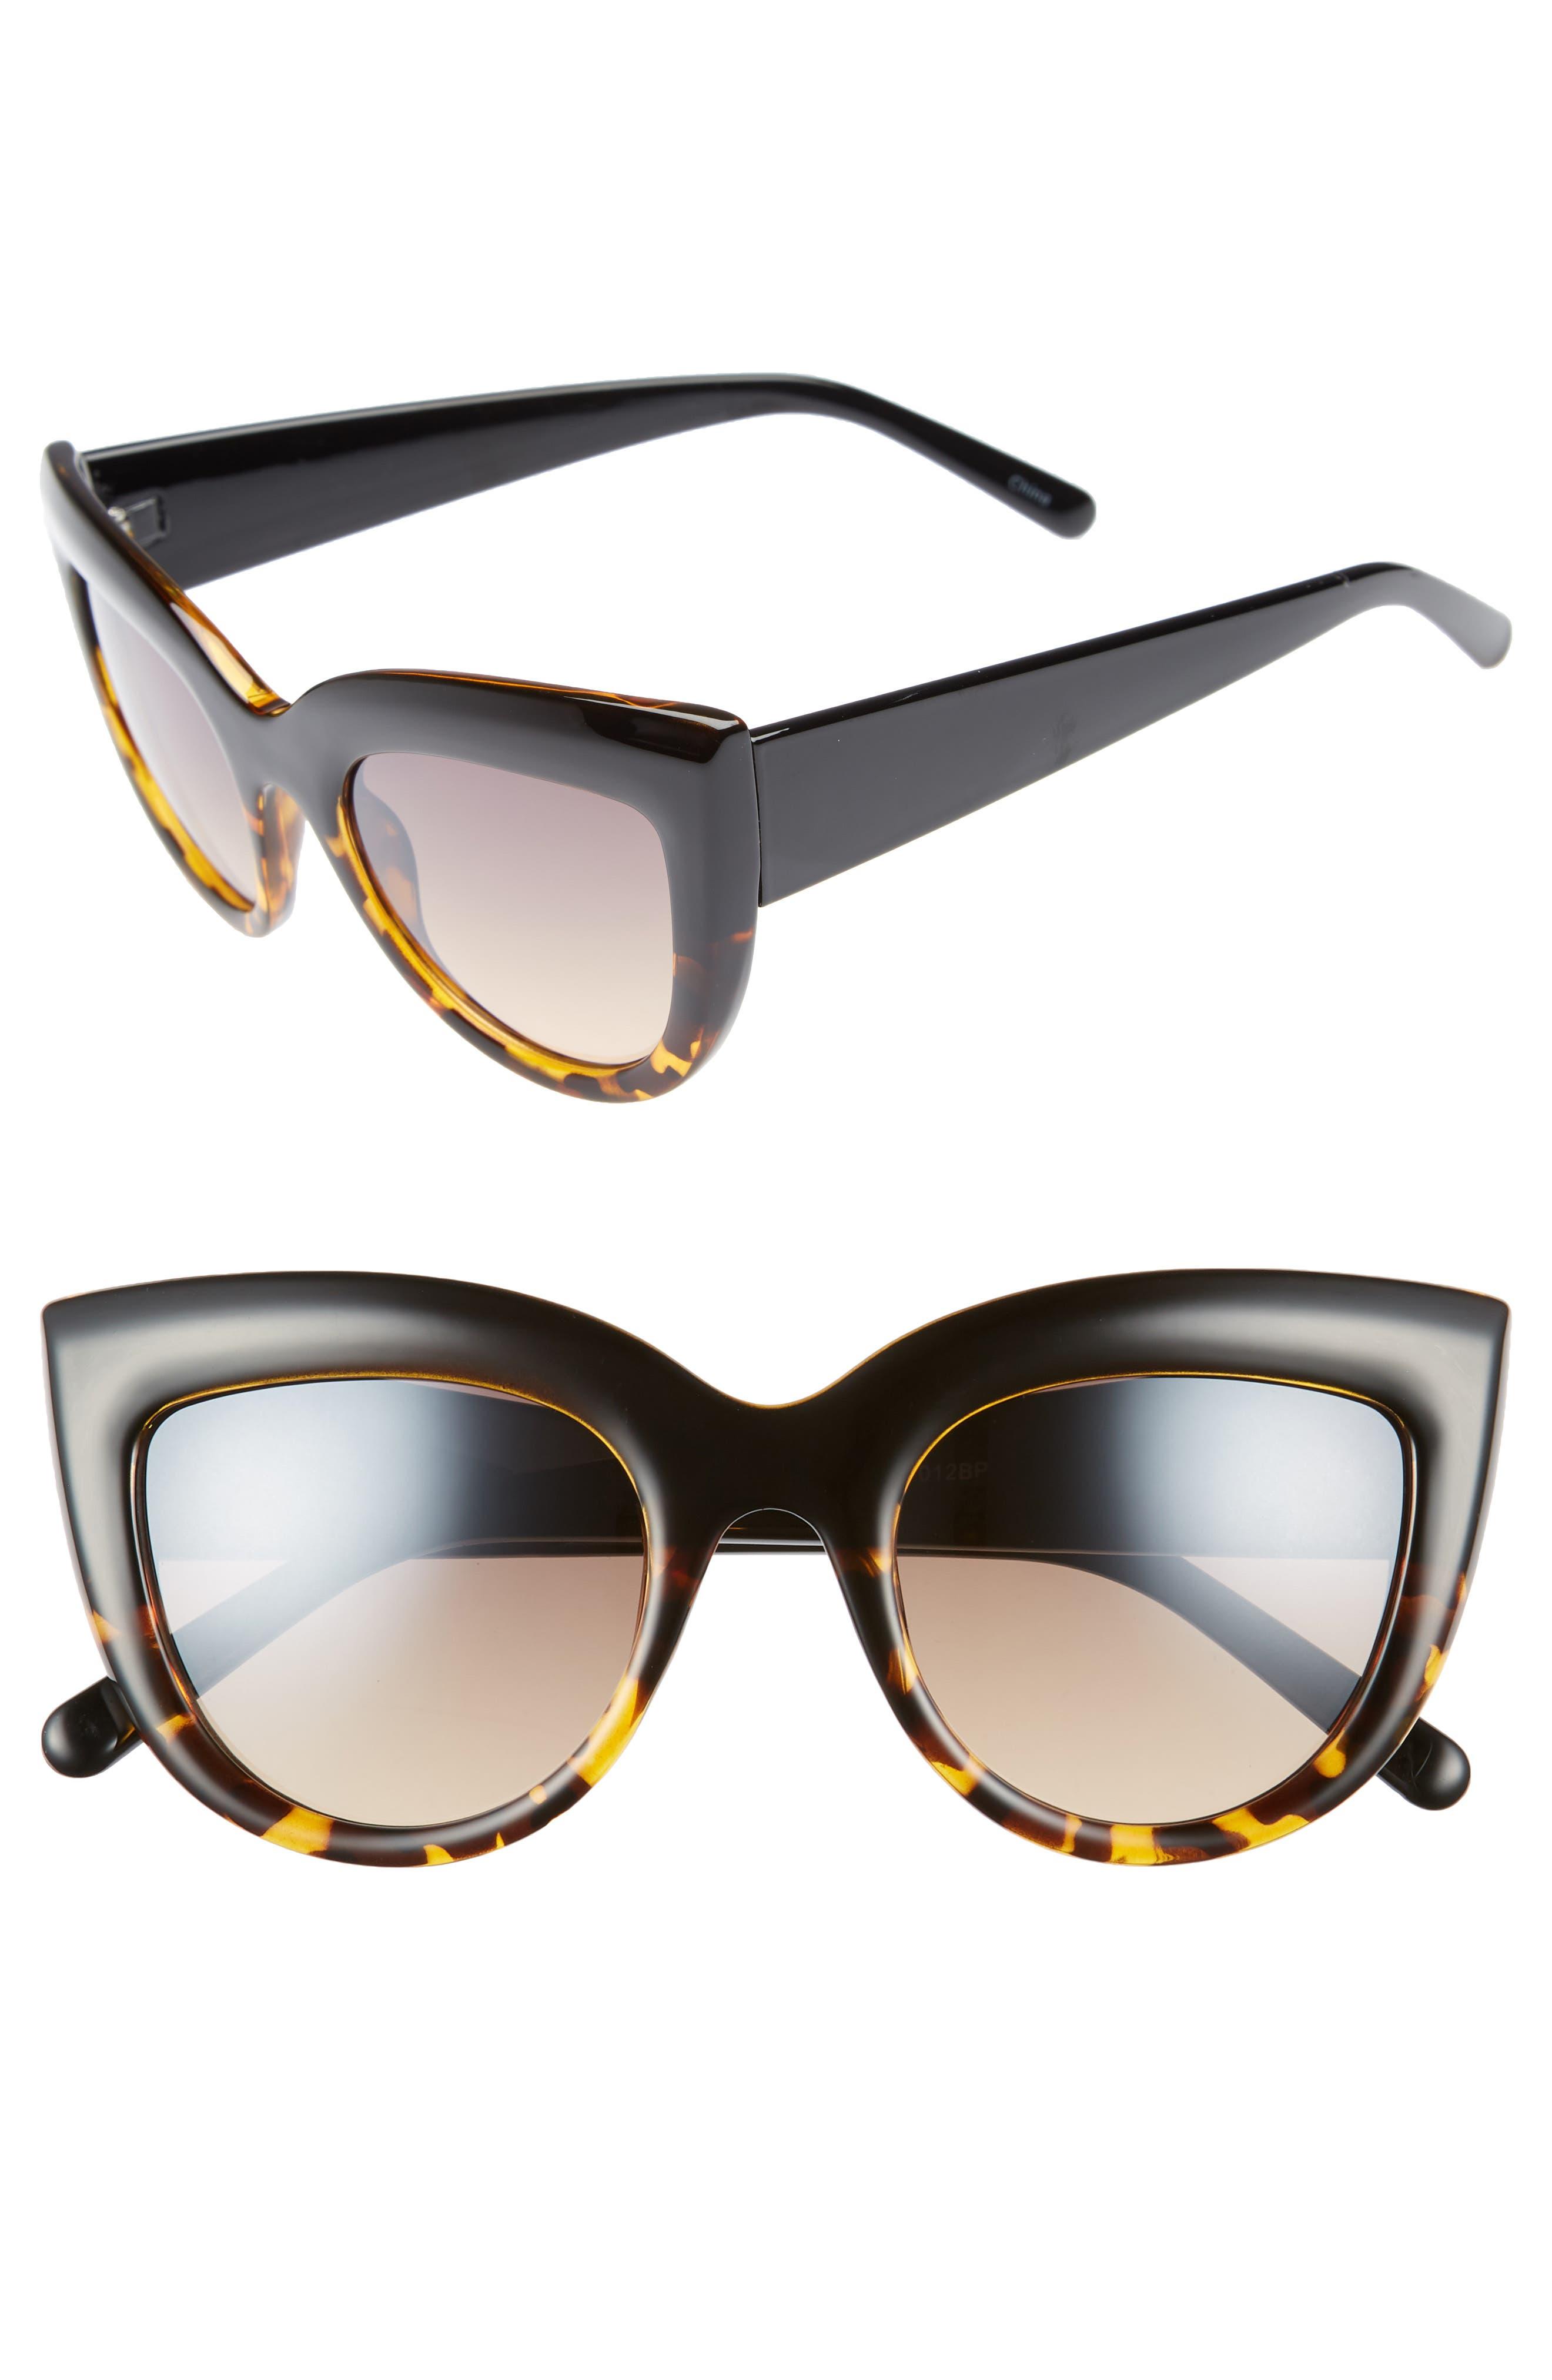 60mm Two-Tone Cat Eye Sunglasses,                             Main thumbnail 1, color,                             Black/ Tort